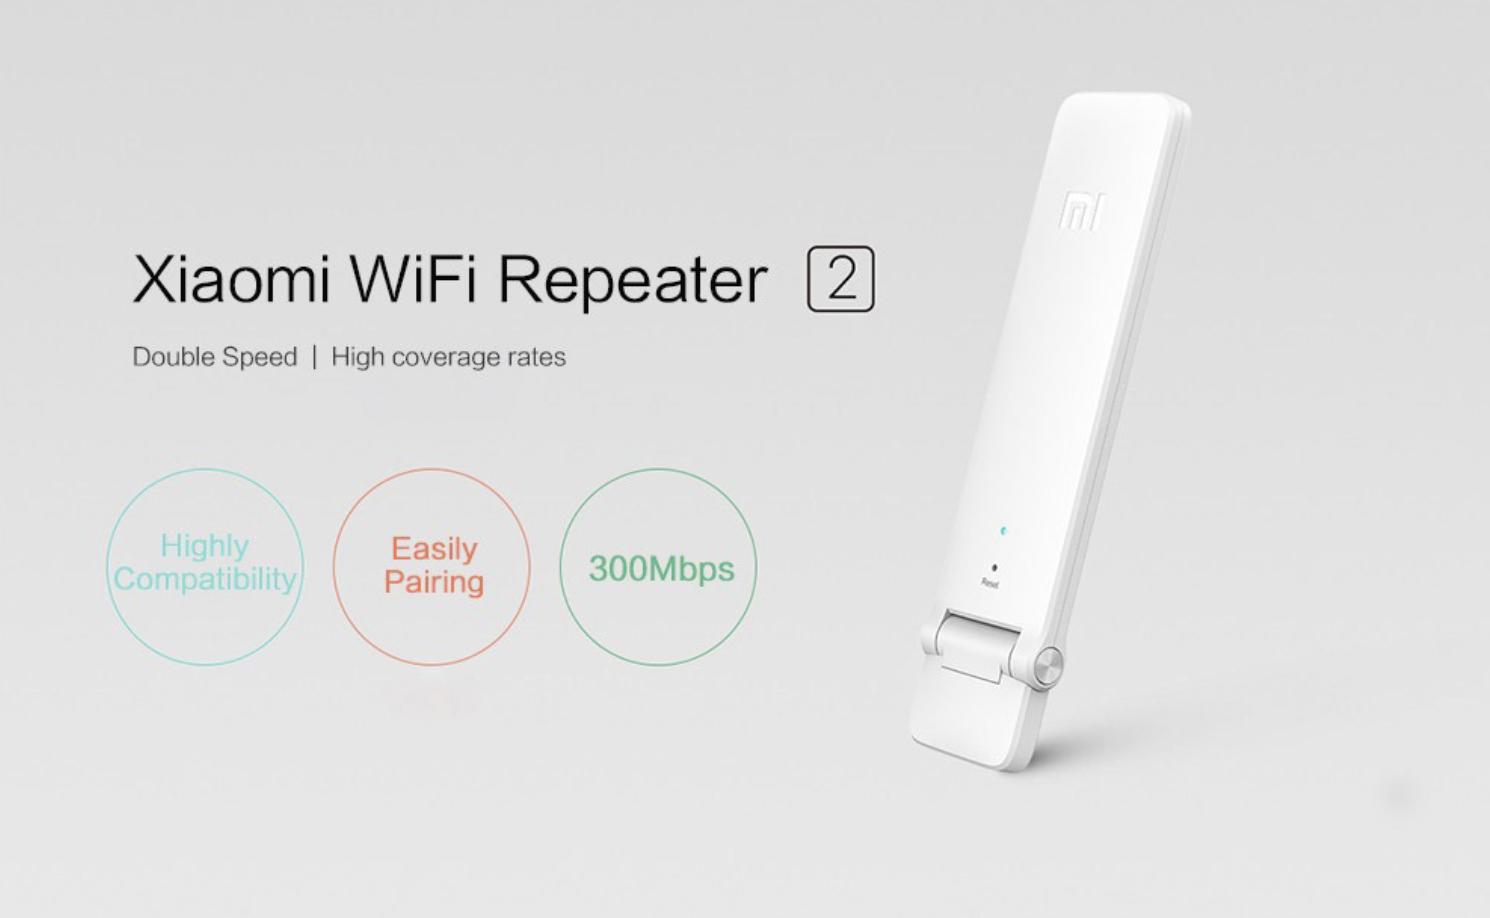 goedkope WiFi-extenders van AliExpress